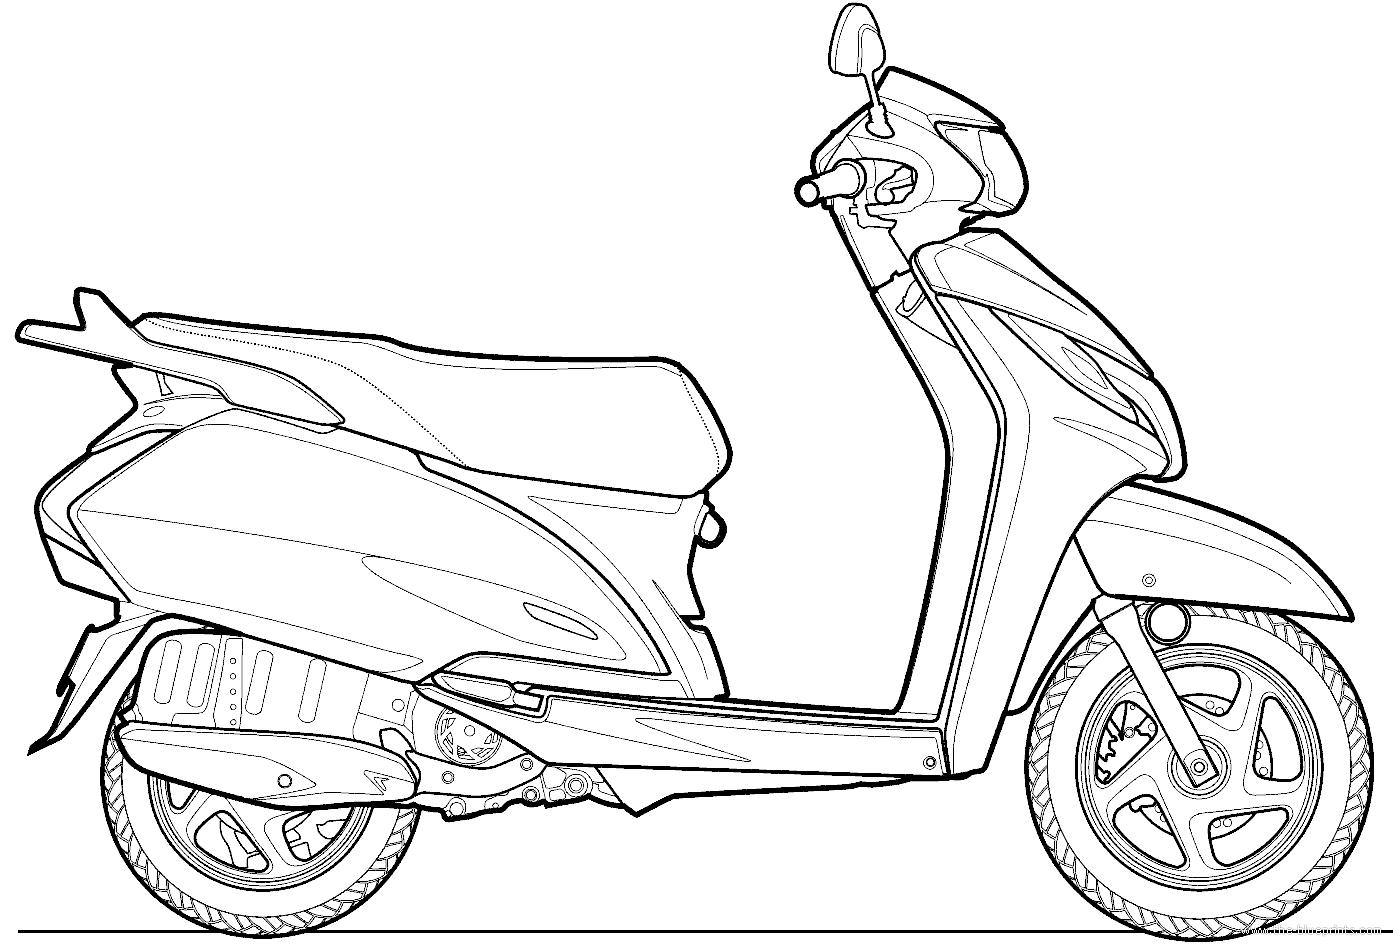 Blueprints > Motorcycles > Honda > Honda Activa 125 (2014)